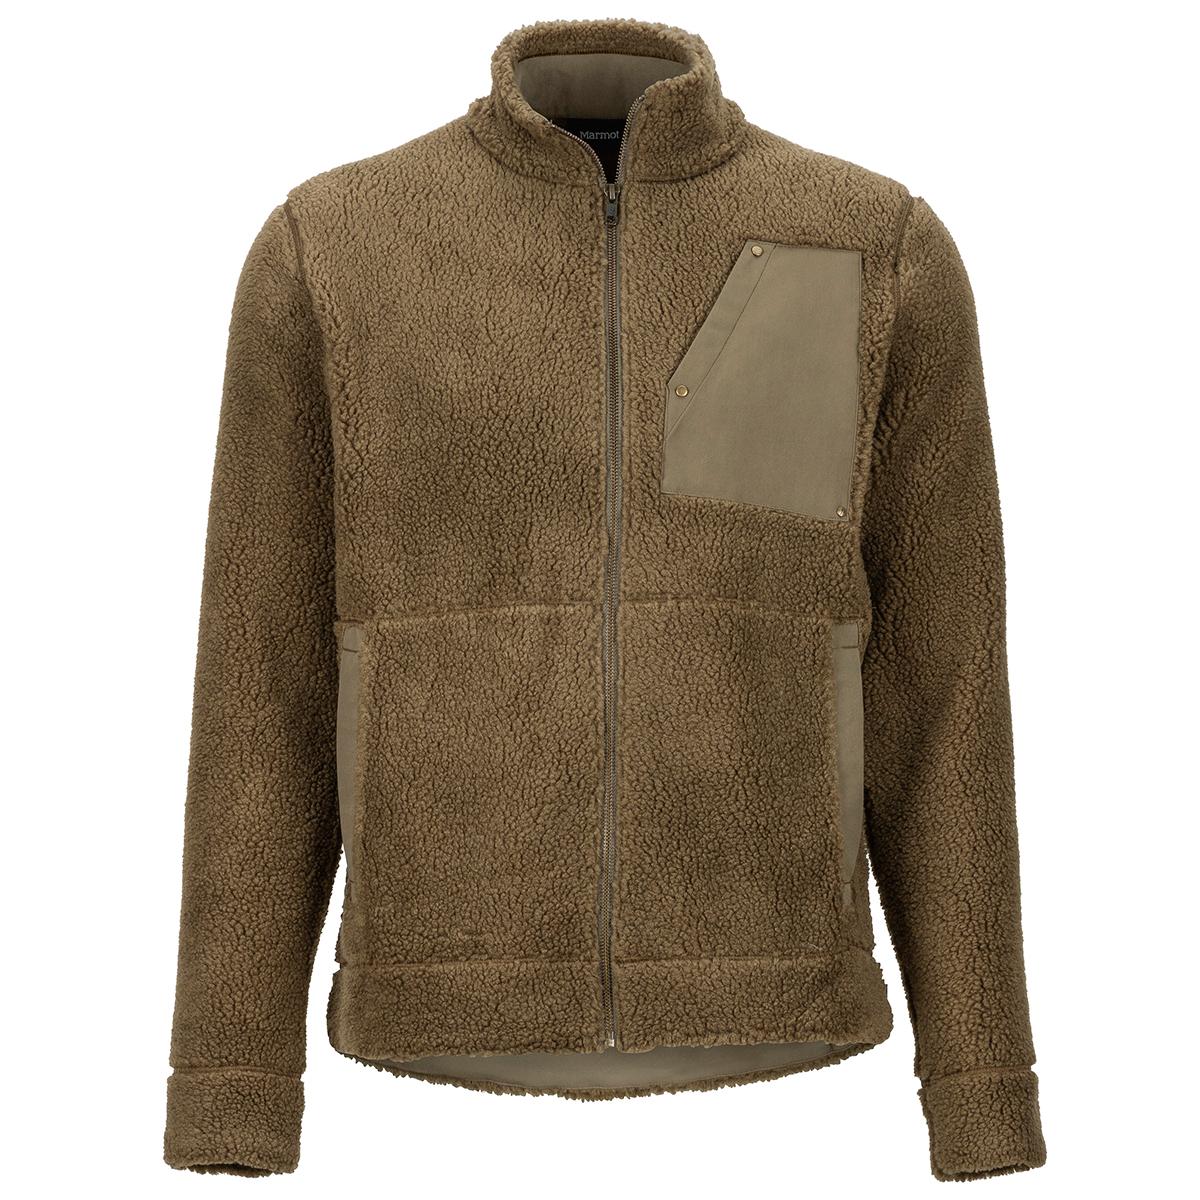 Marmot Men's Larson Jacket - Brown, M